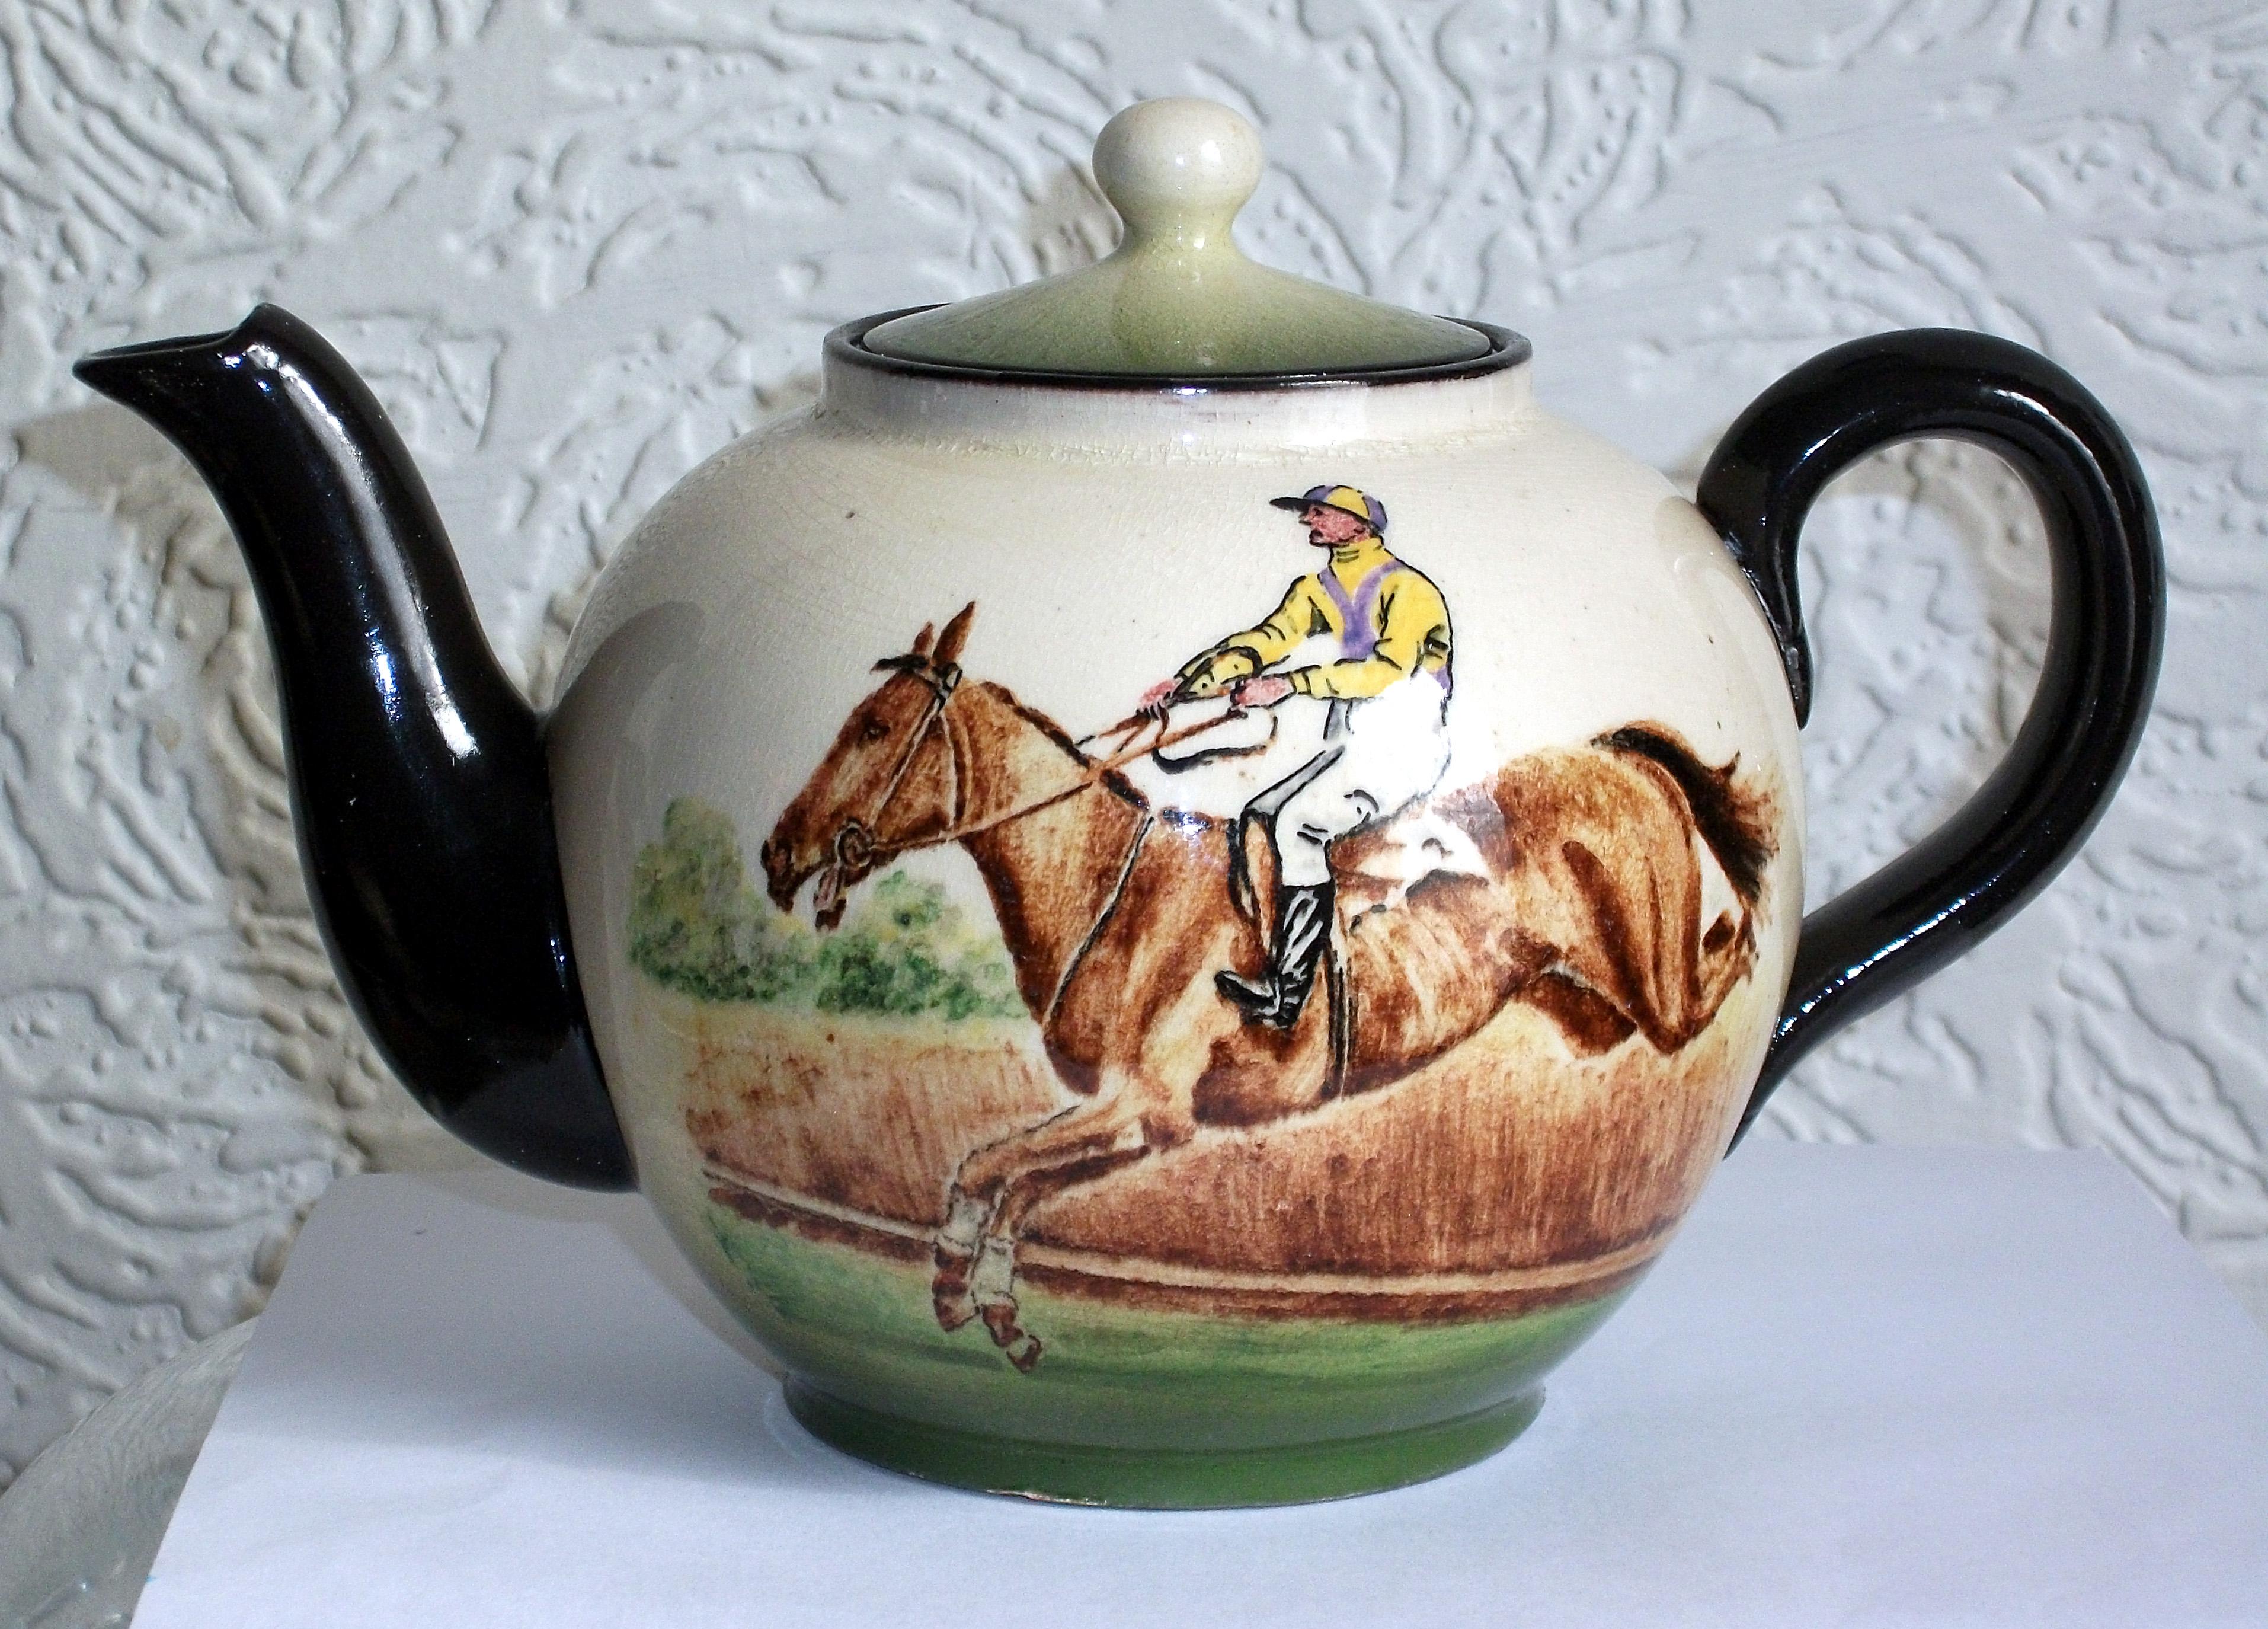 Watcombe sporting teapot